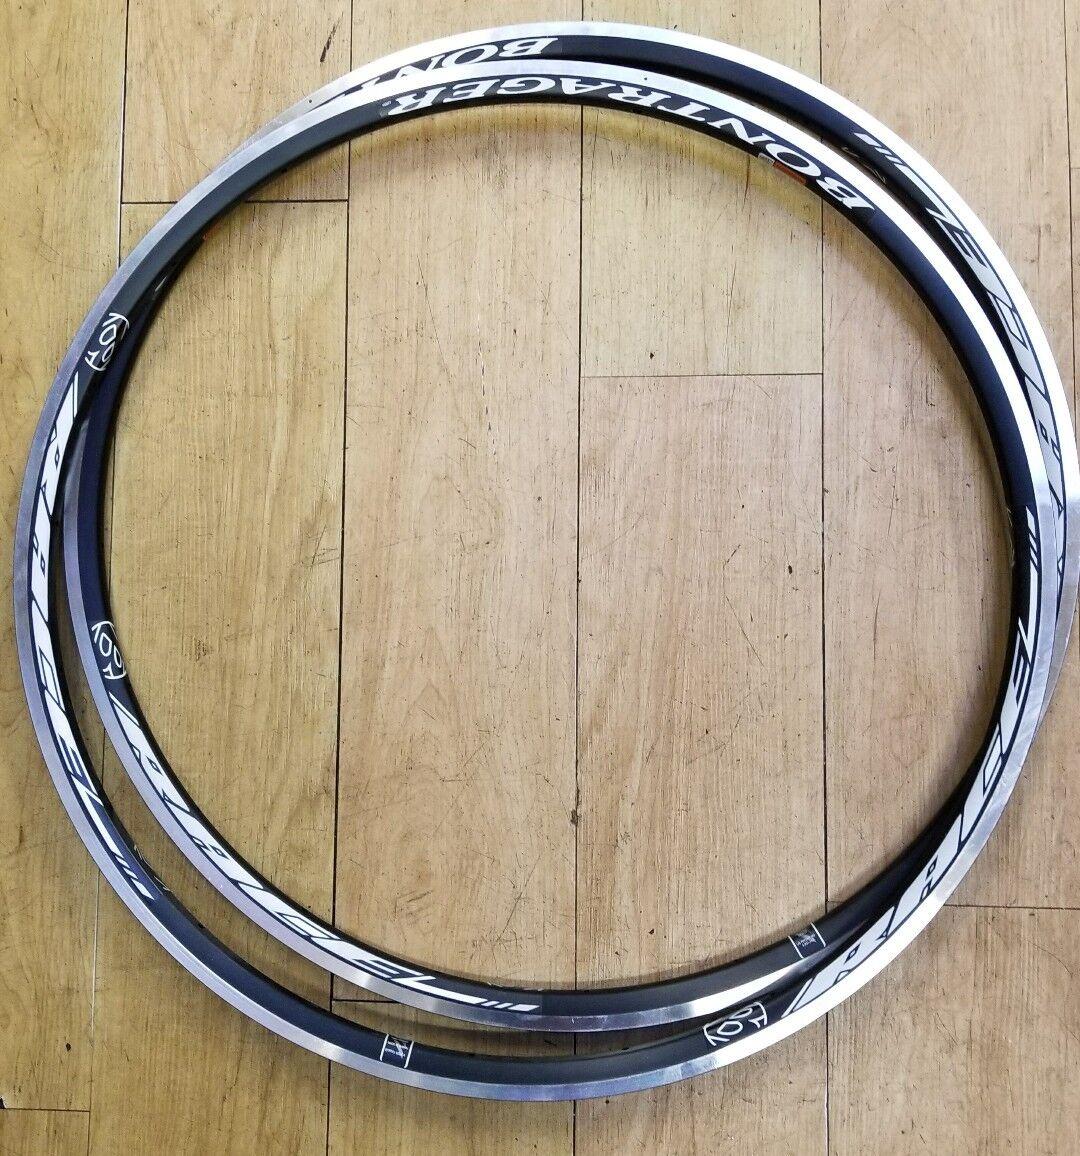 One Brand New 700c Bontrager Race Rim 20 hole Part